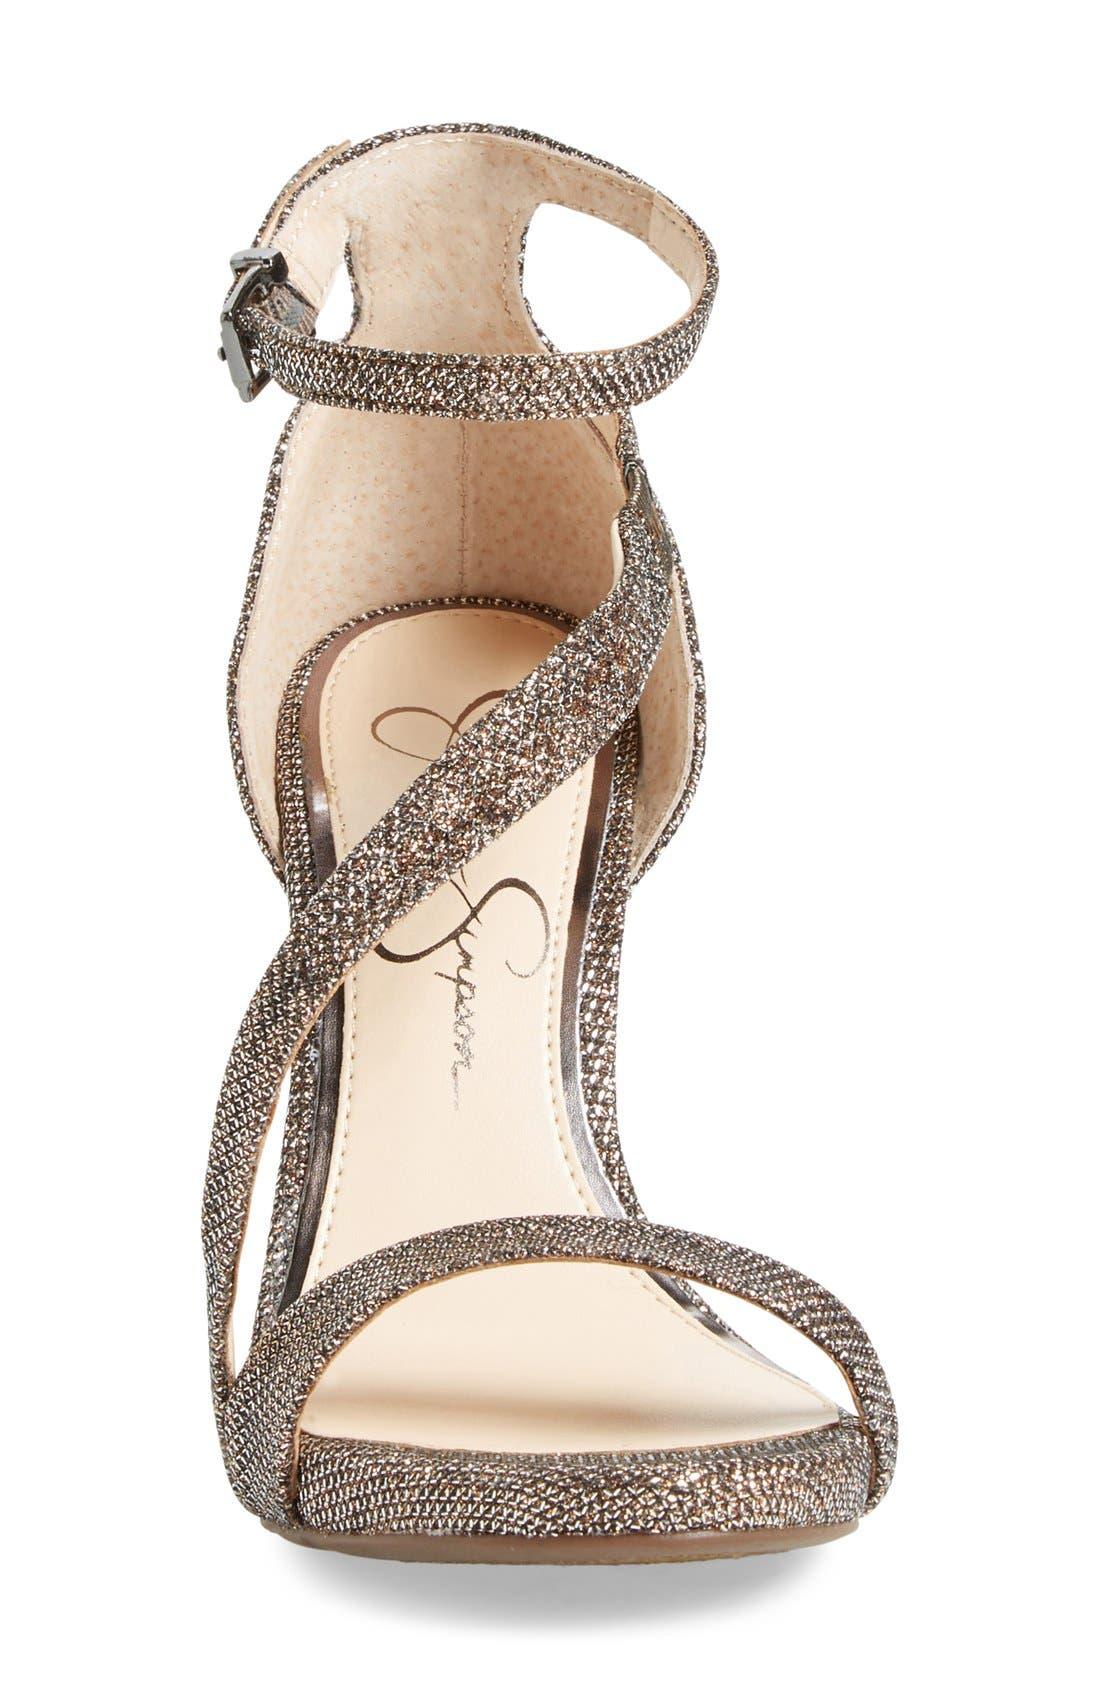 Alternate Image 3  - Jessica Simpson 'Rayli' Patent Ankle Strap Sandal (Women)